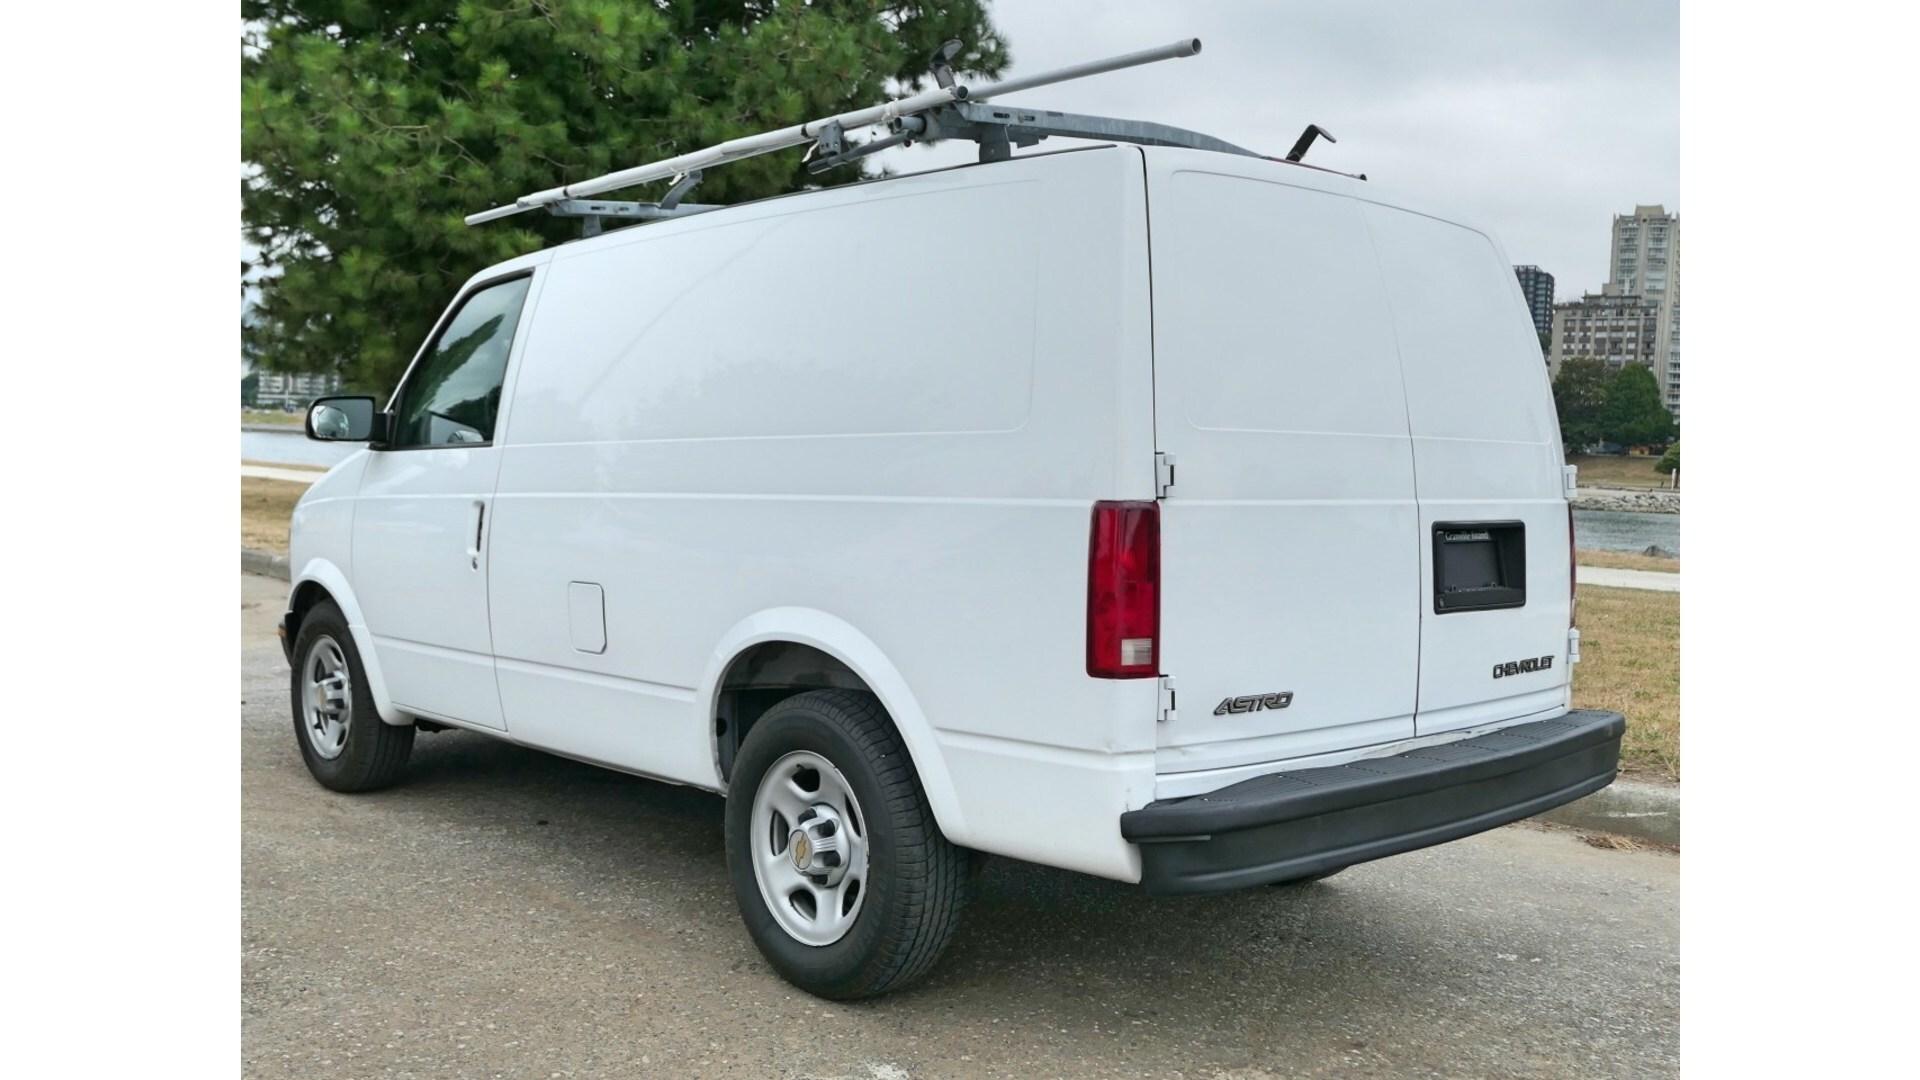 2005 Chevrolet ASTRO Cargo Van - w/ Bluetooth, Backup Camera